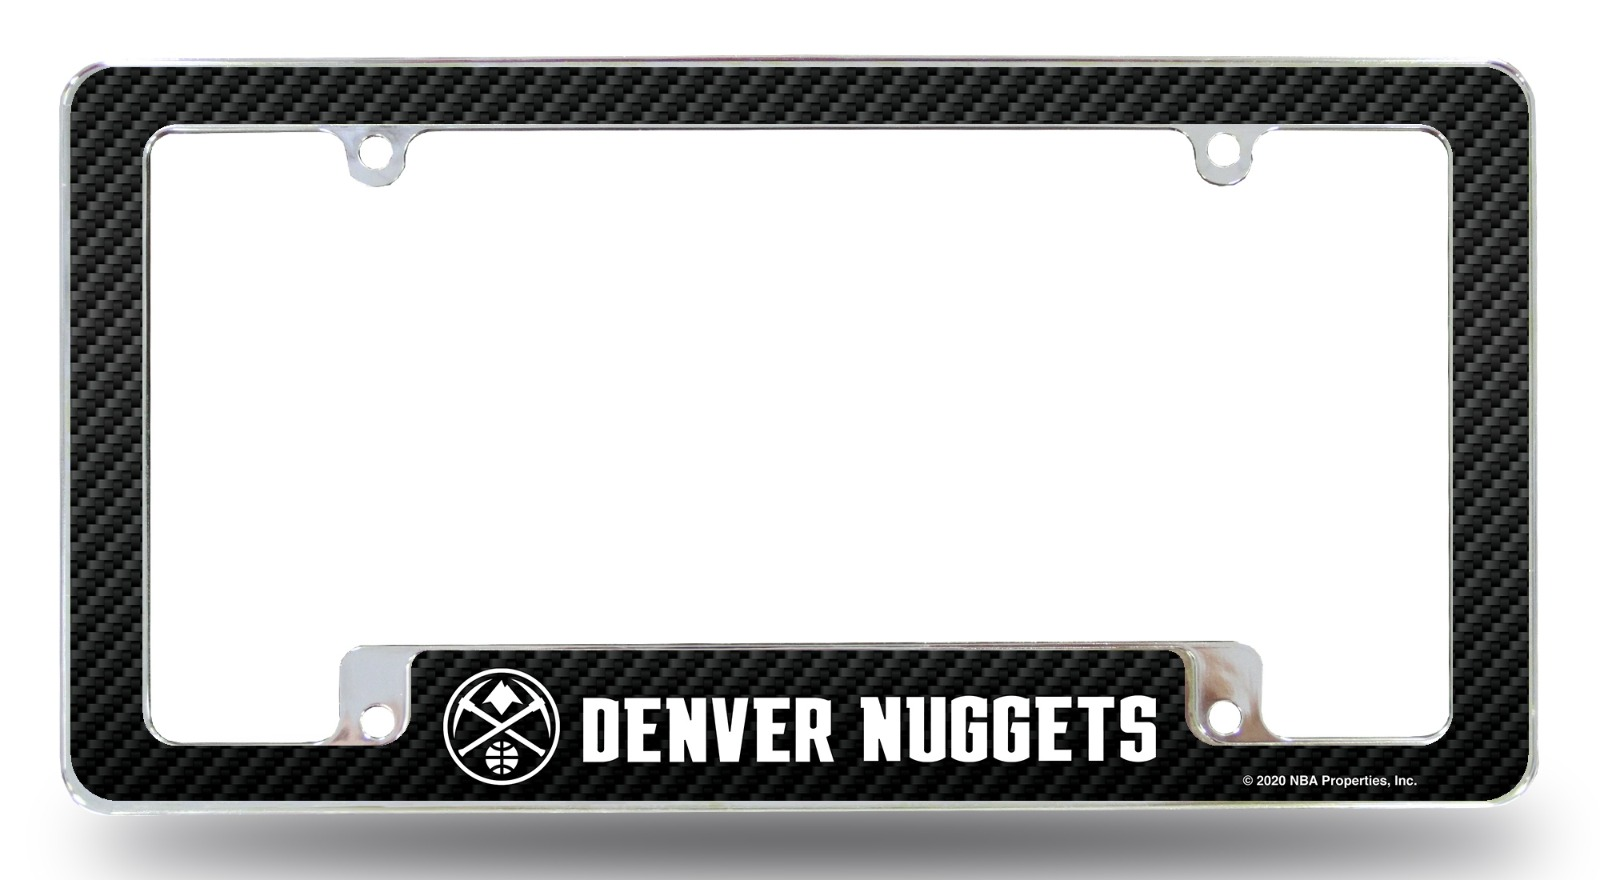 Denver Nuggets Metal License Plate Frame EZ View Carbon Fibe